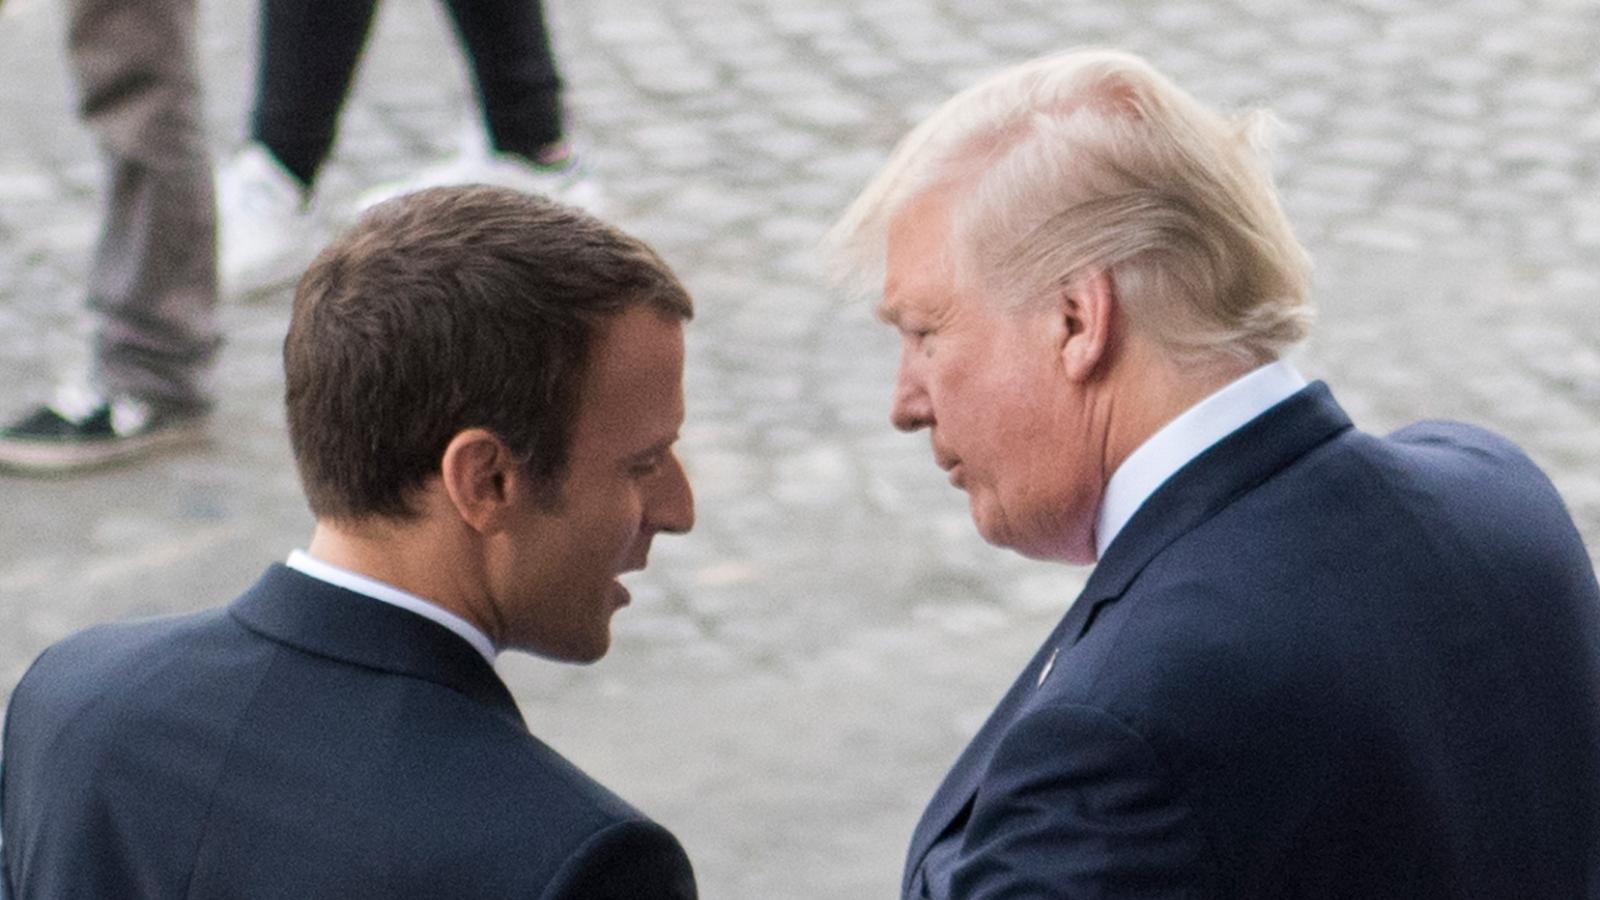 Macron og Trump på Bastille-dagen i Paris 2017. Foto fra wikimedia commons, public domain. CC BY DoD